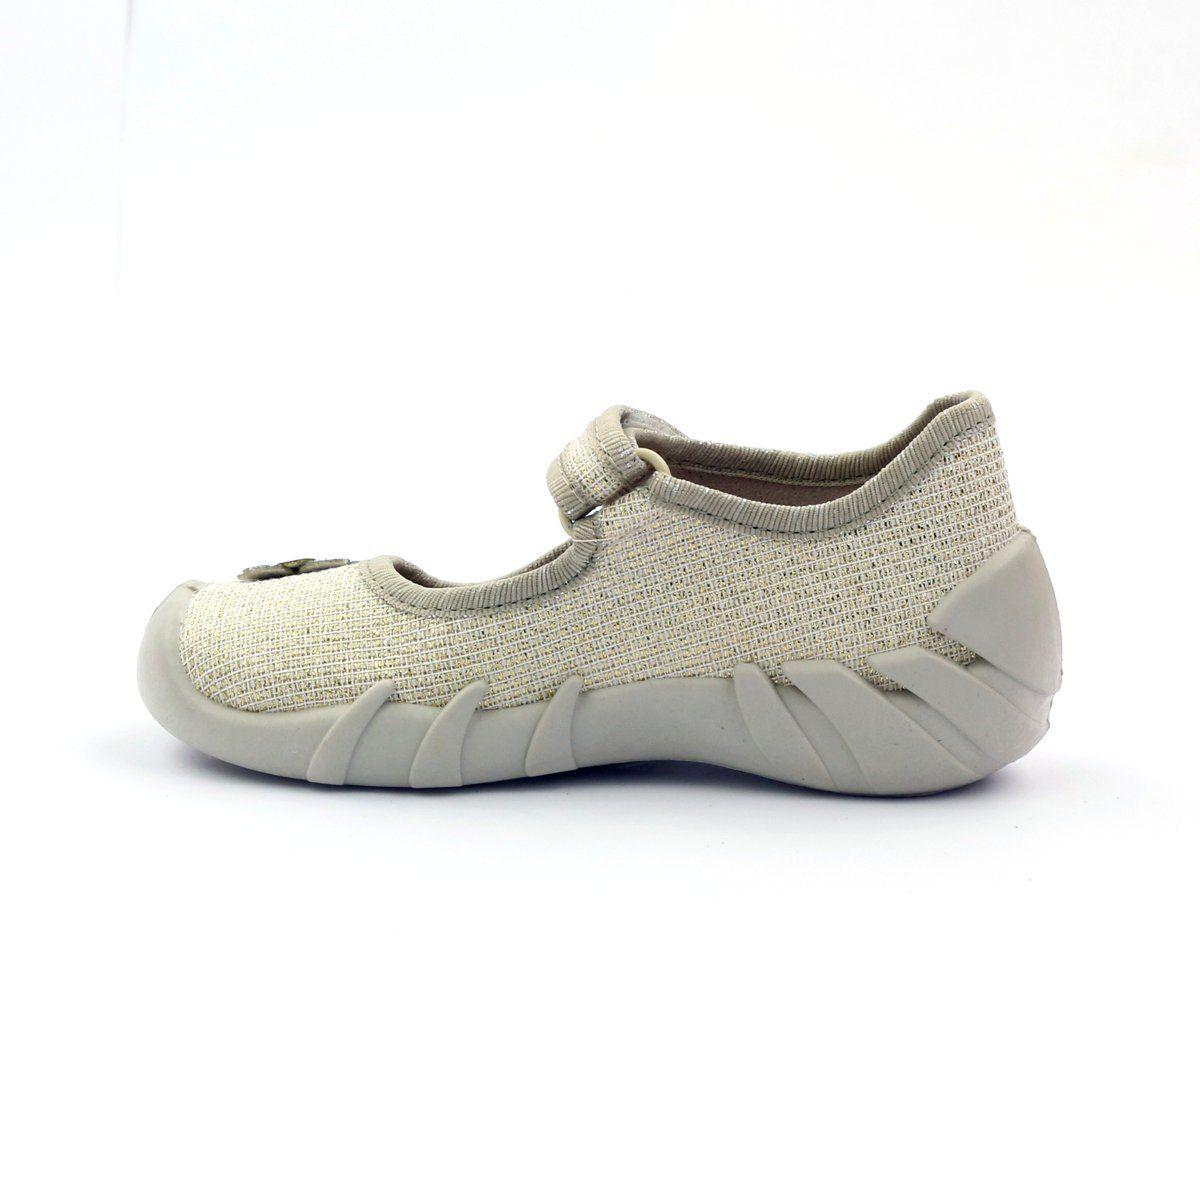 Befado Children S Shoes Ballerinas Slippers 109p163 Brown Grey Yellow Childrens Shoes Ballerina Slippers Childrens Slippers